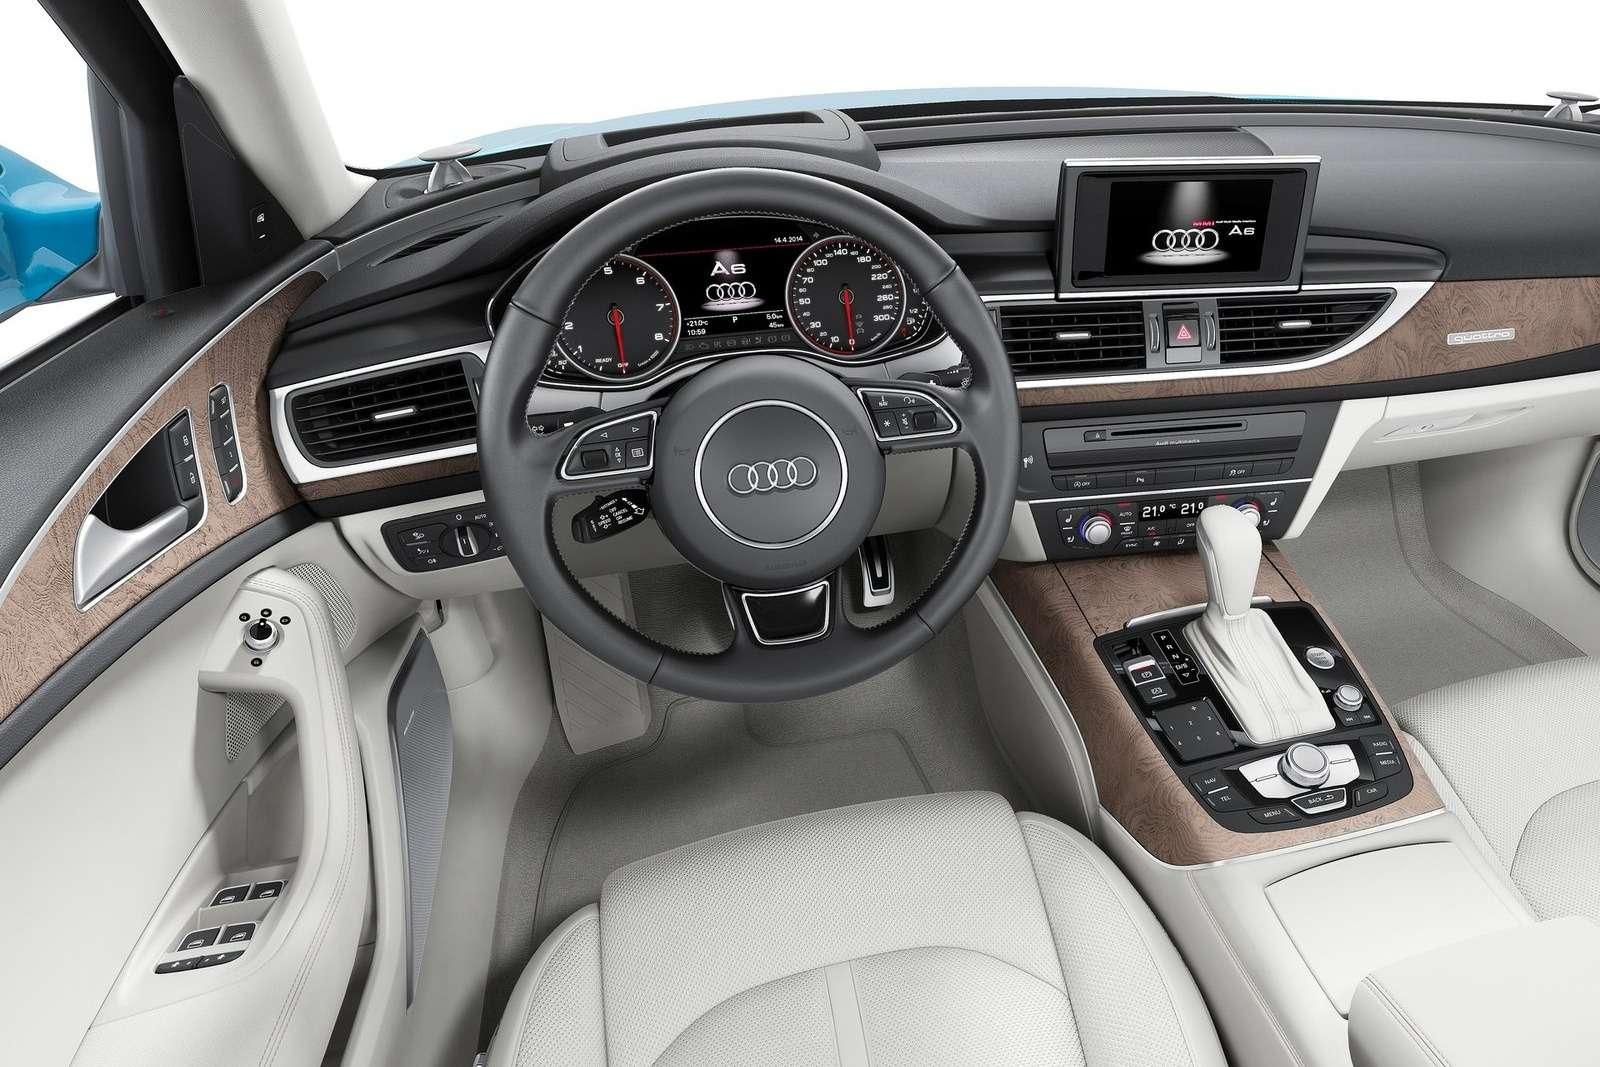 Audi-A6_2015_1600x1200_wallpaper_06